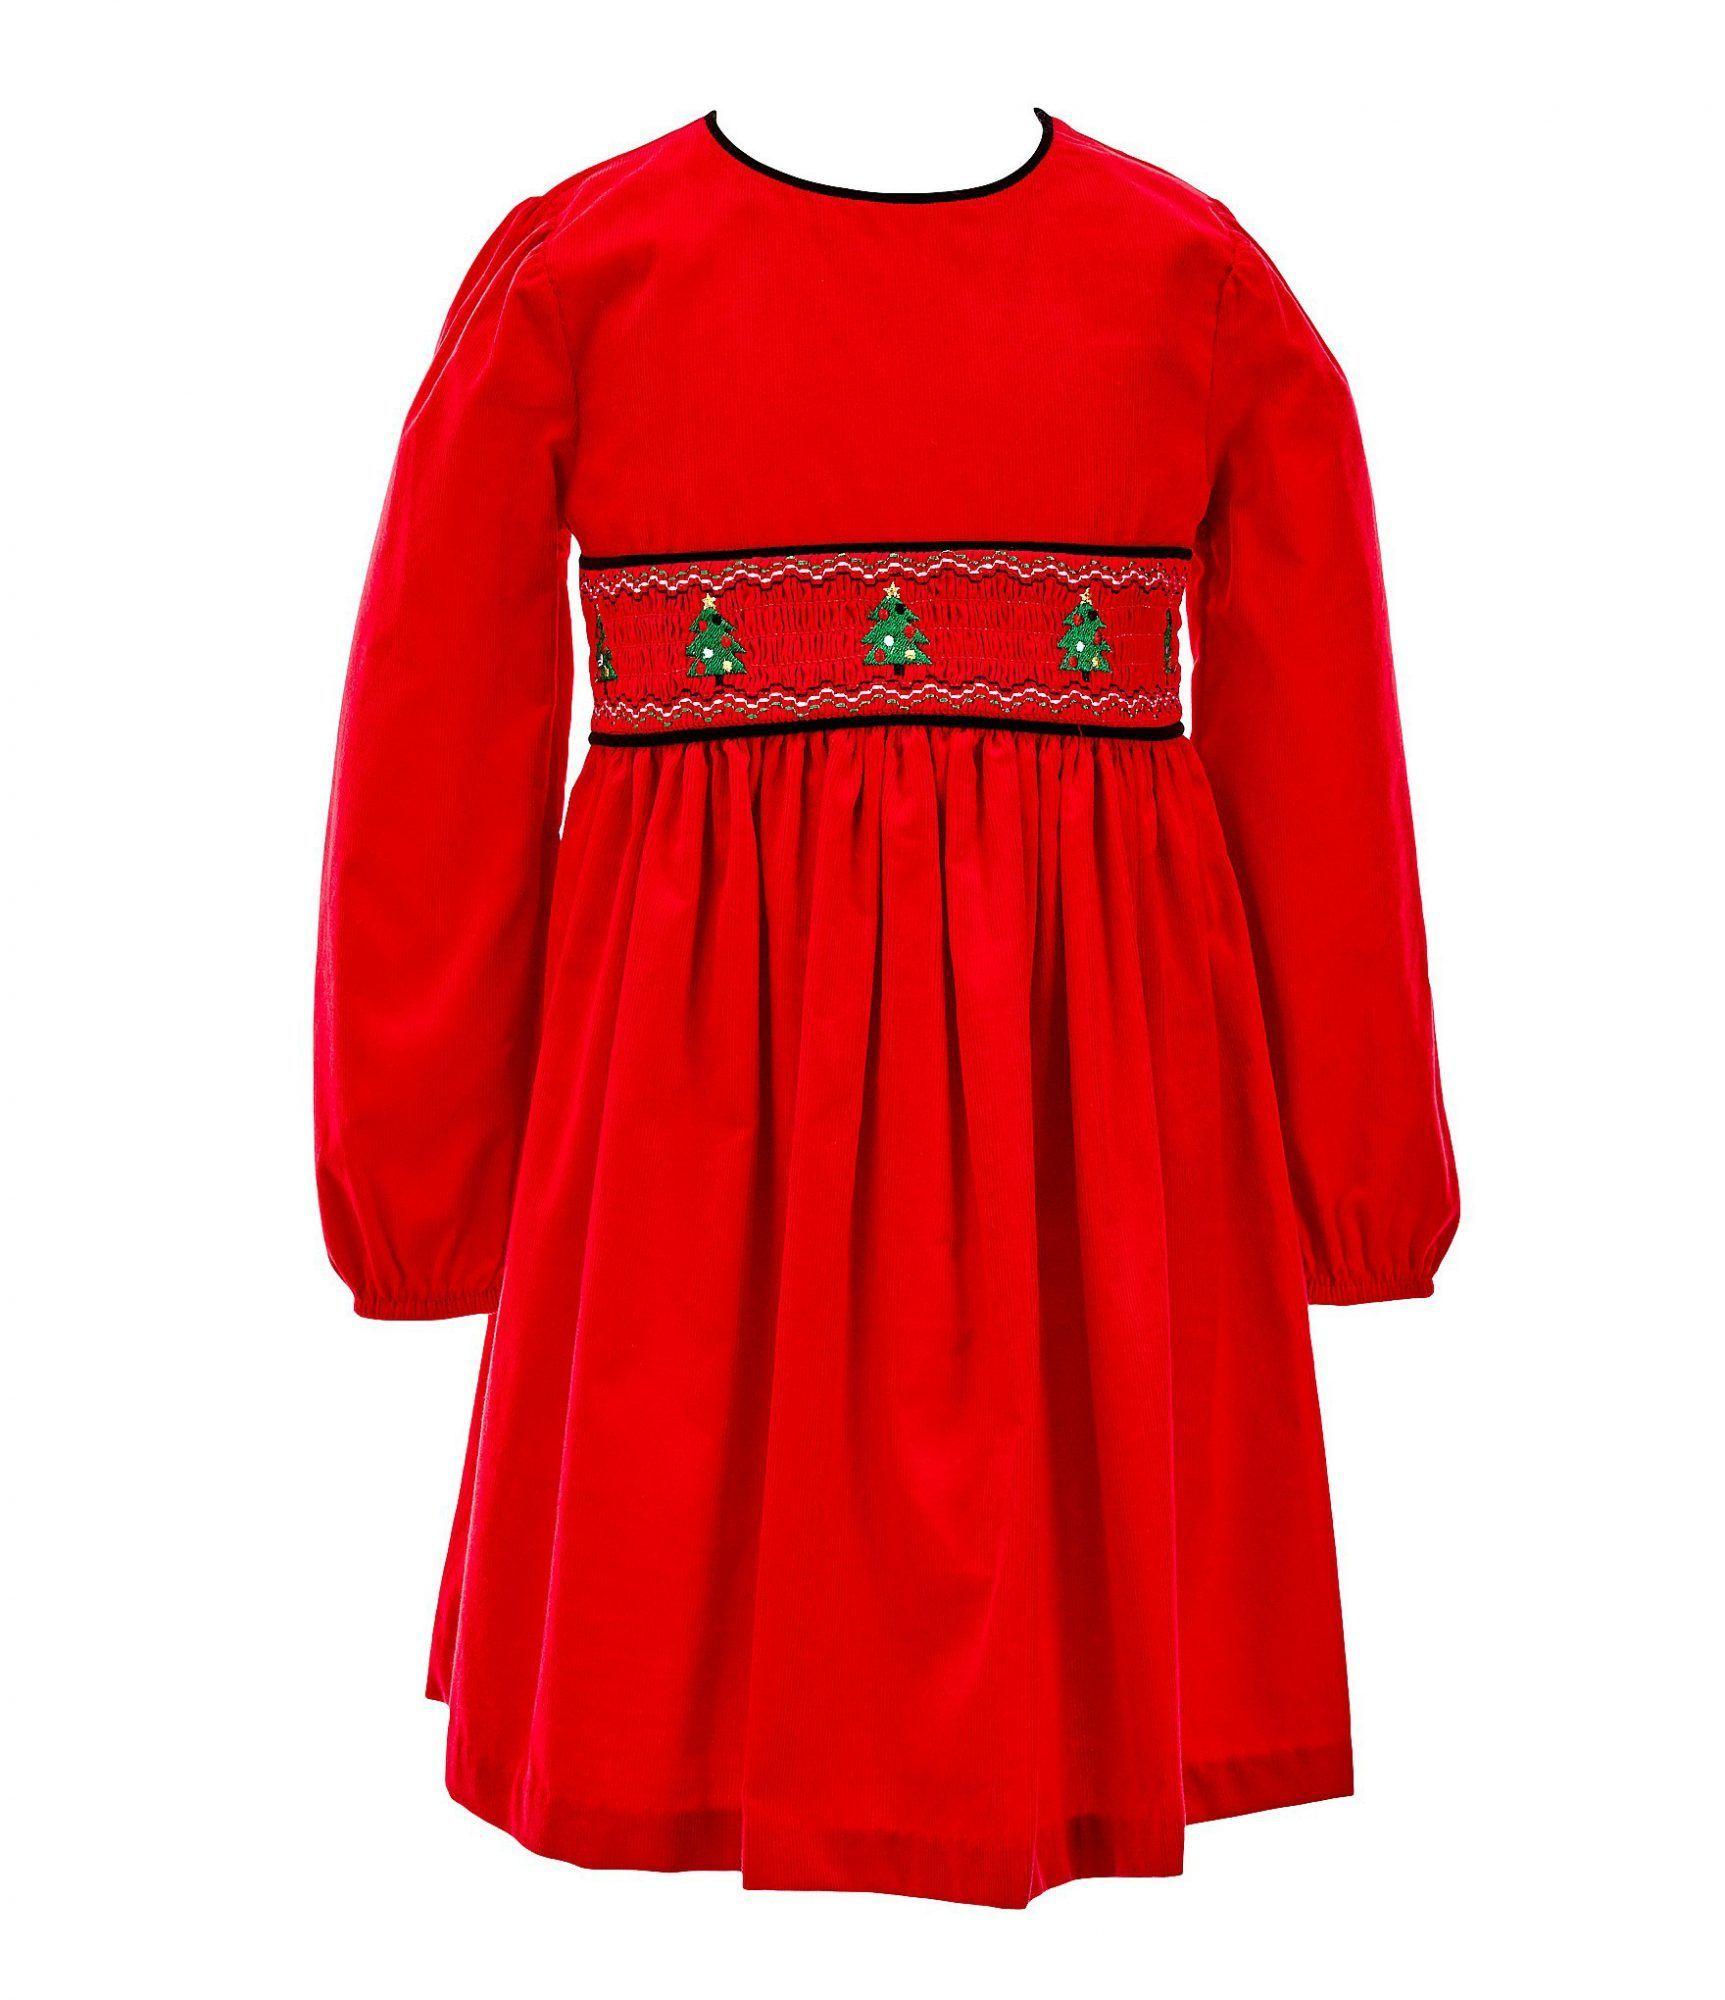 Our Favorite Christmas Dresses For Little Girls Bonnie Jean Little Girl Christmas Dresses Little Girl Dresses [ 2000 x 1725 Pixel ]